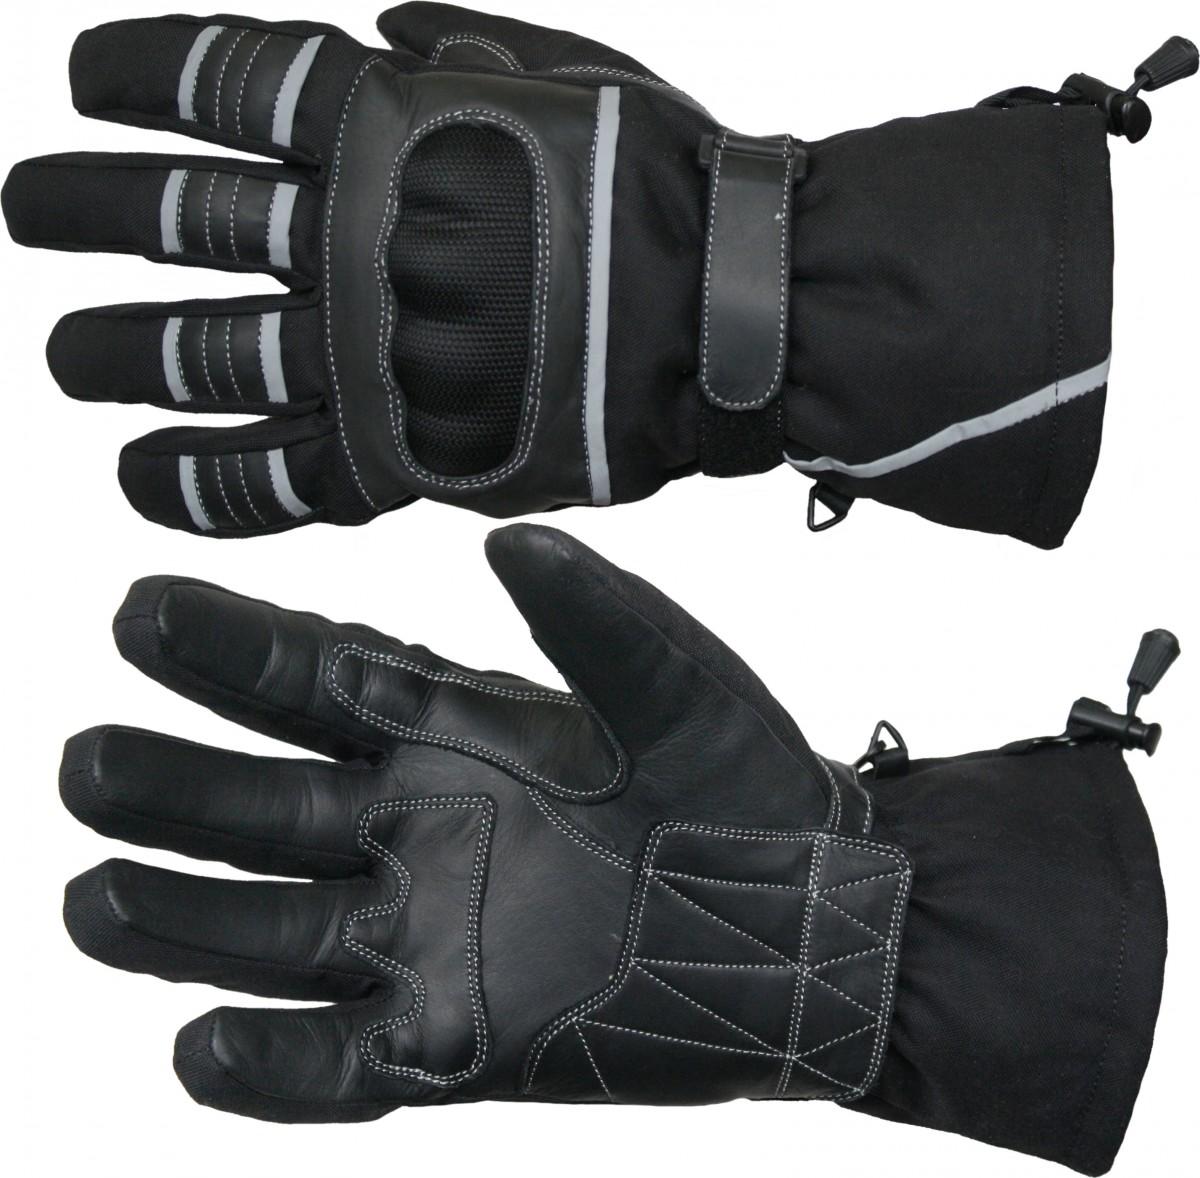 motorradhandschuhe sommer herbst motorrad biker handschuhe. Black Bedroom Furniture Sets. Home Design Ideas